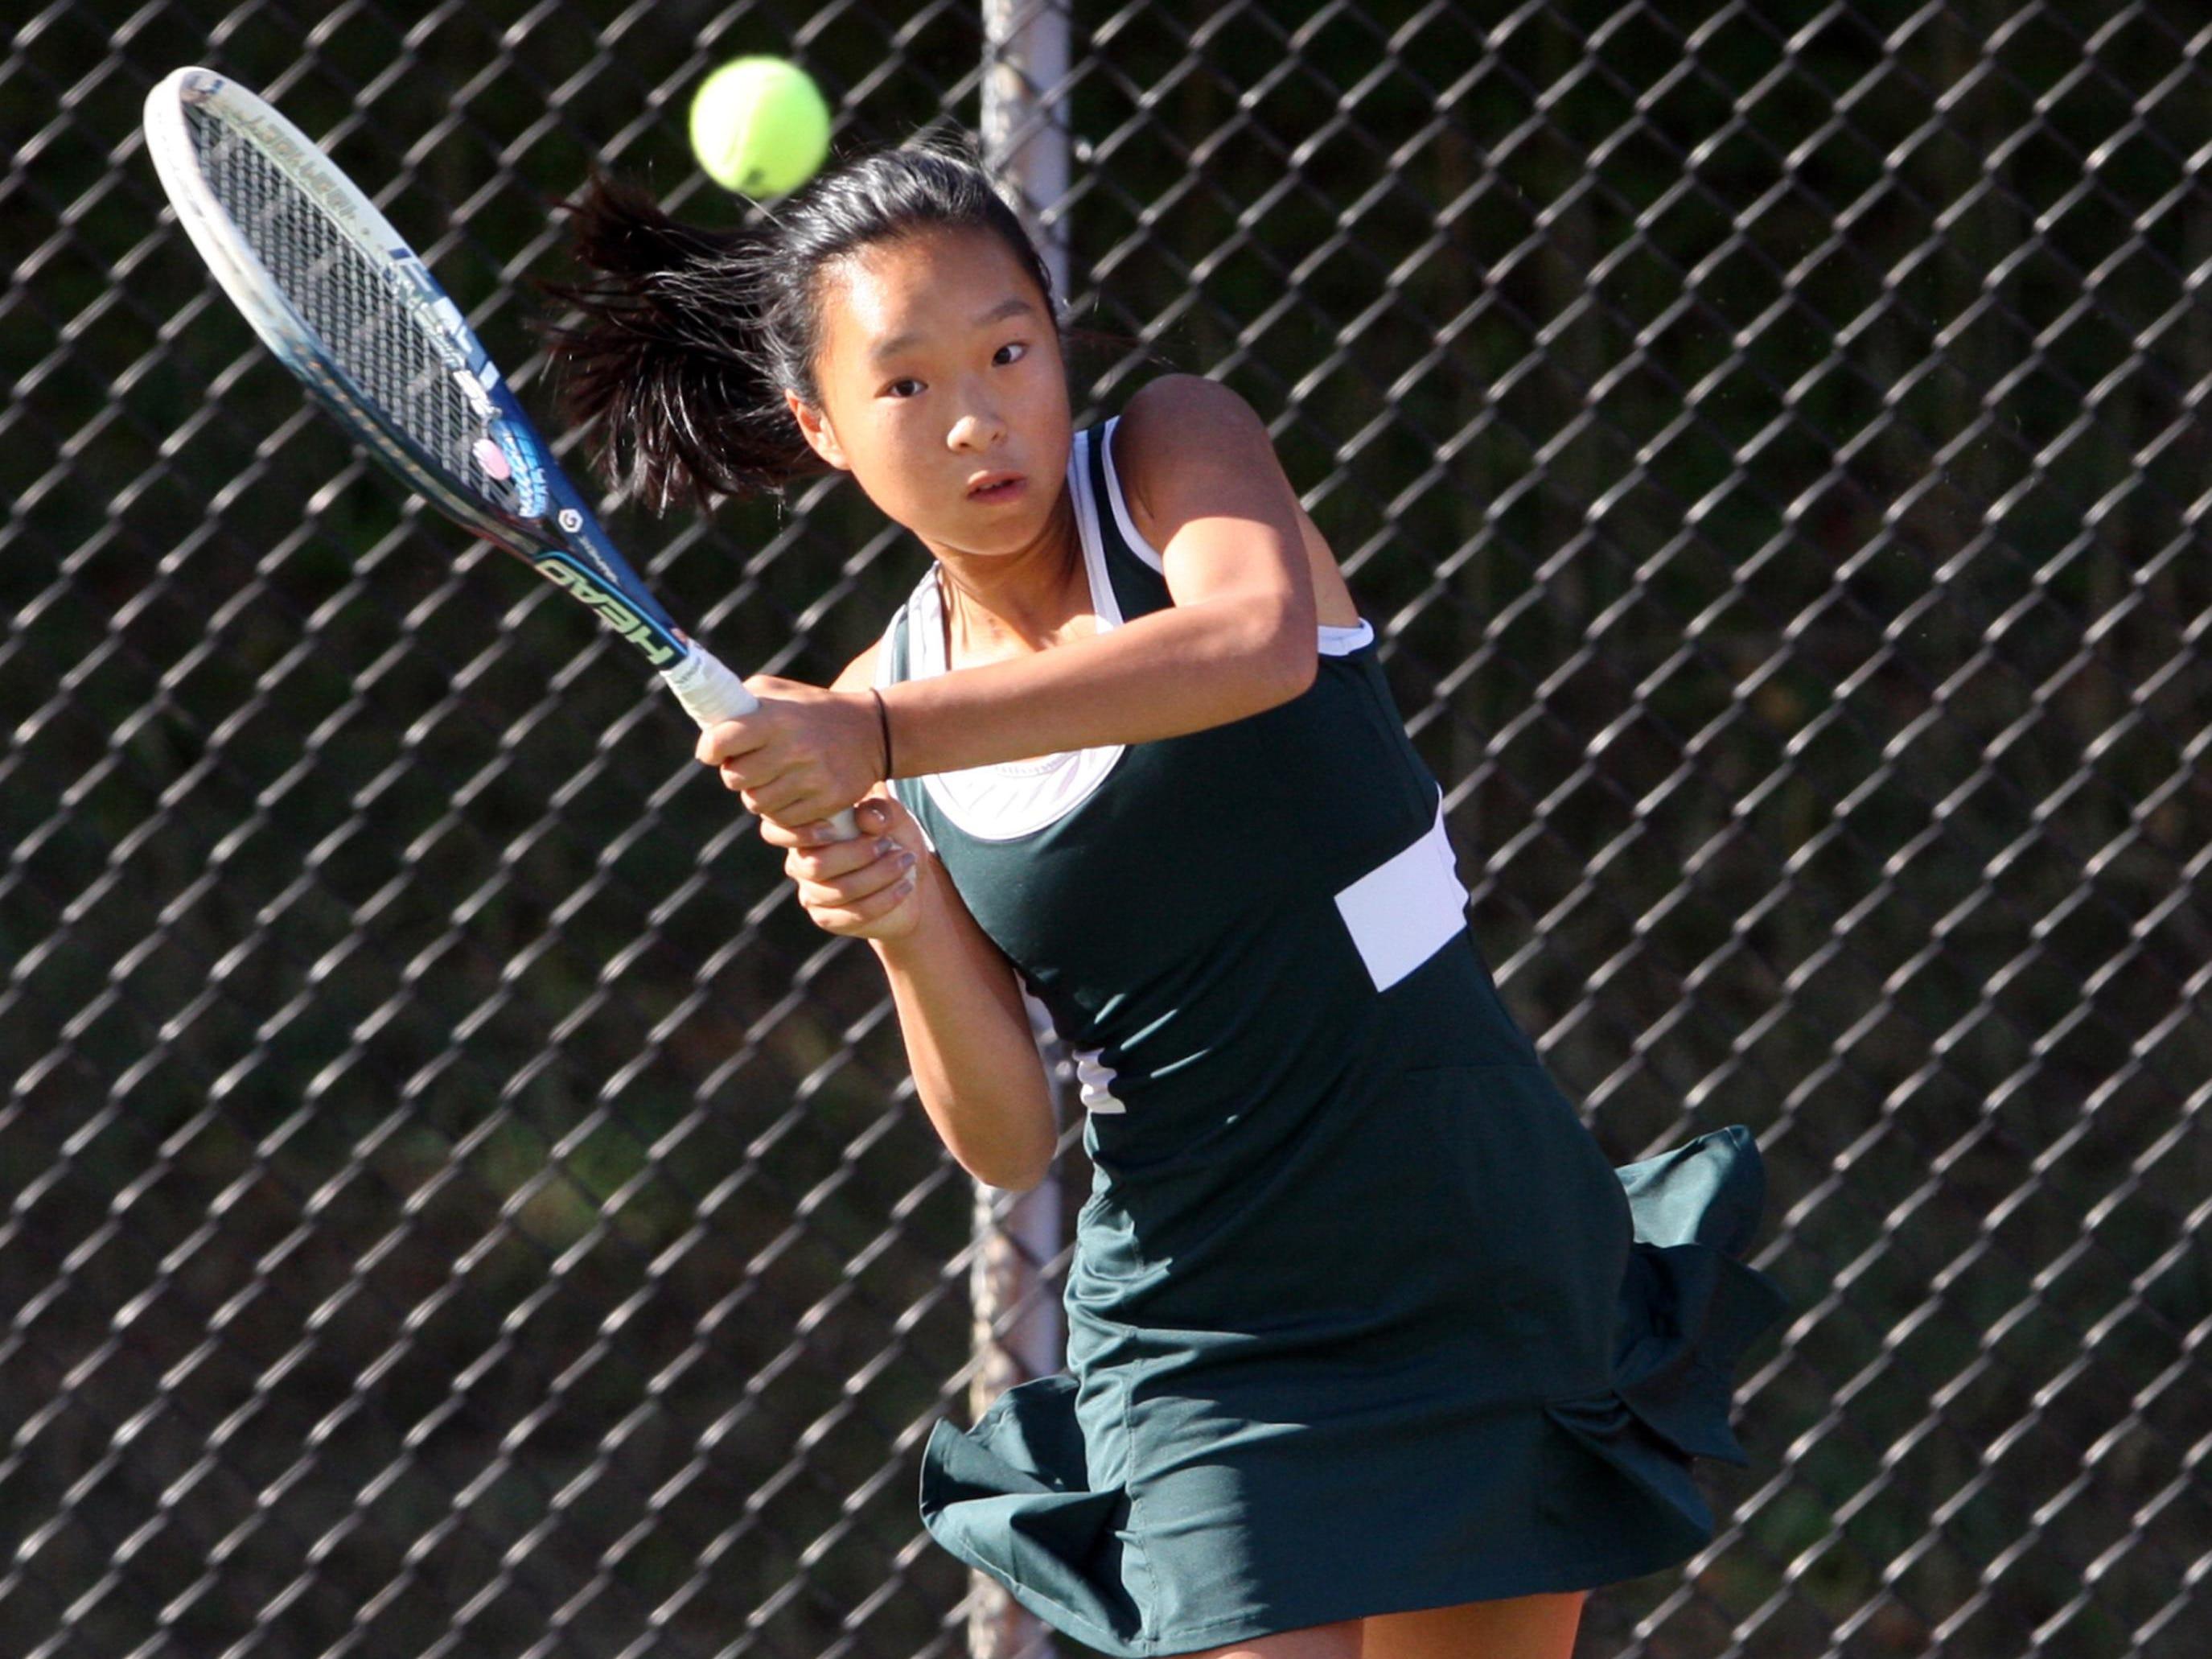 East Brunswick's Jennifer Chen returns a volley during the GMC Tournament first singles final on Sept. 23, 2014.